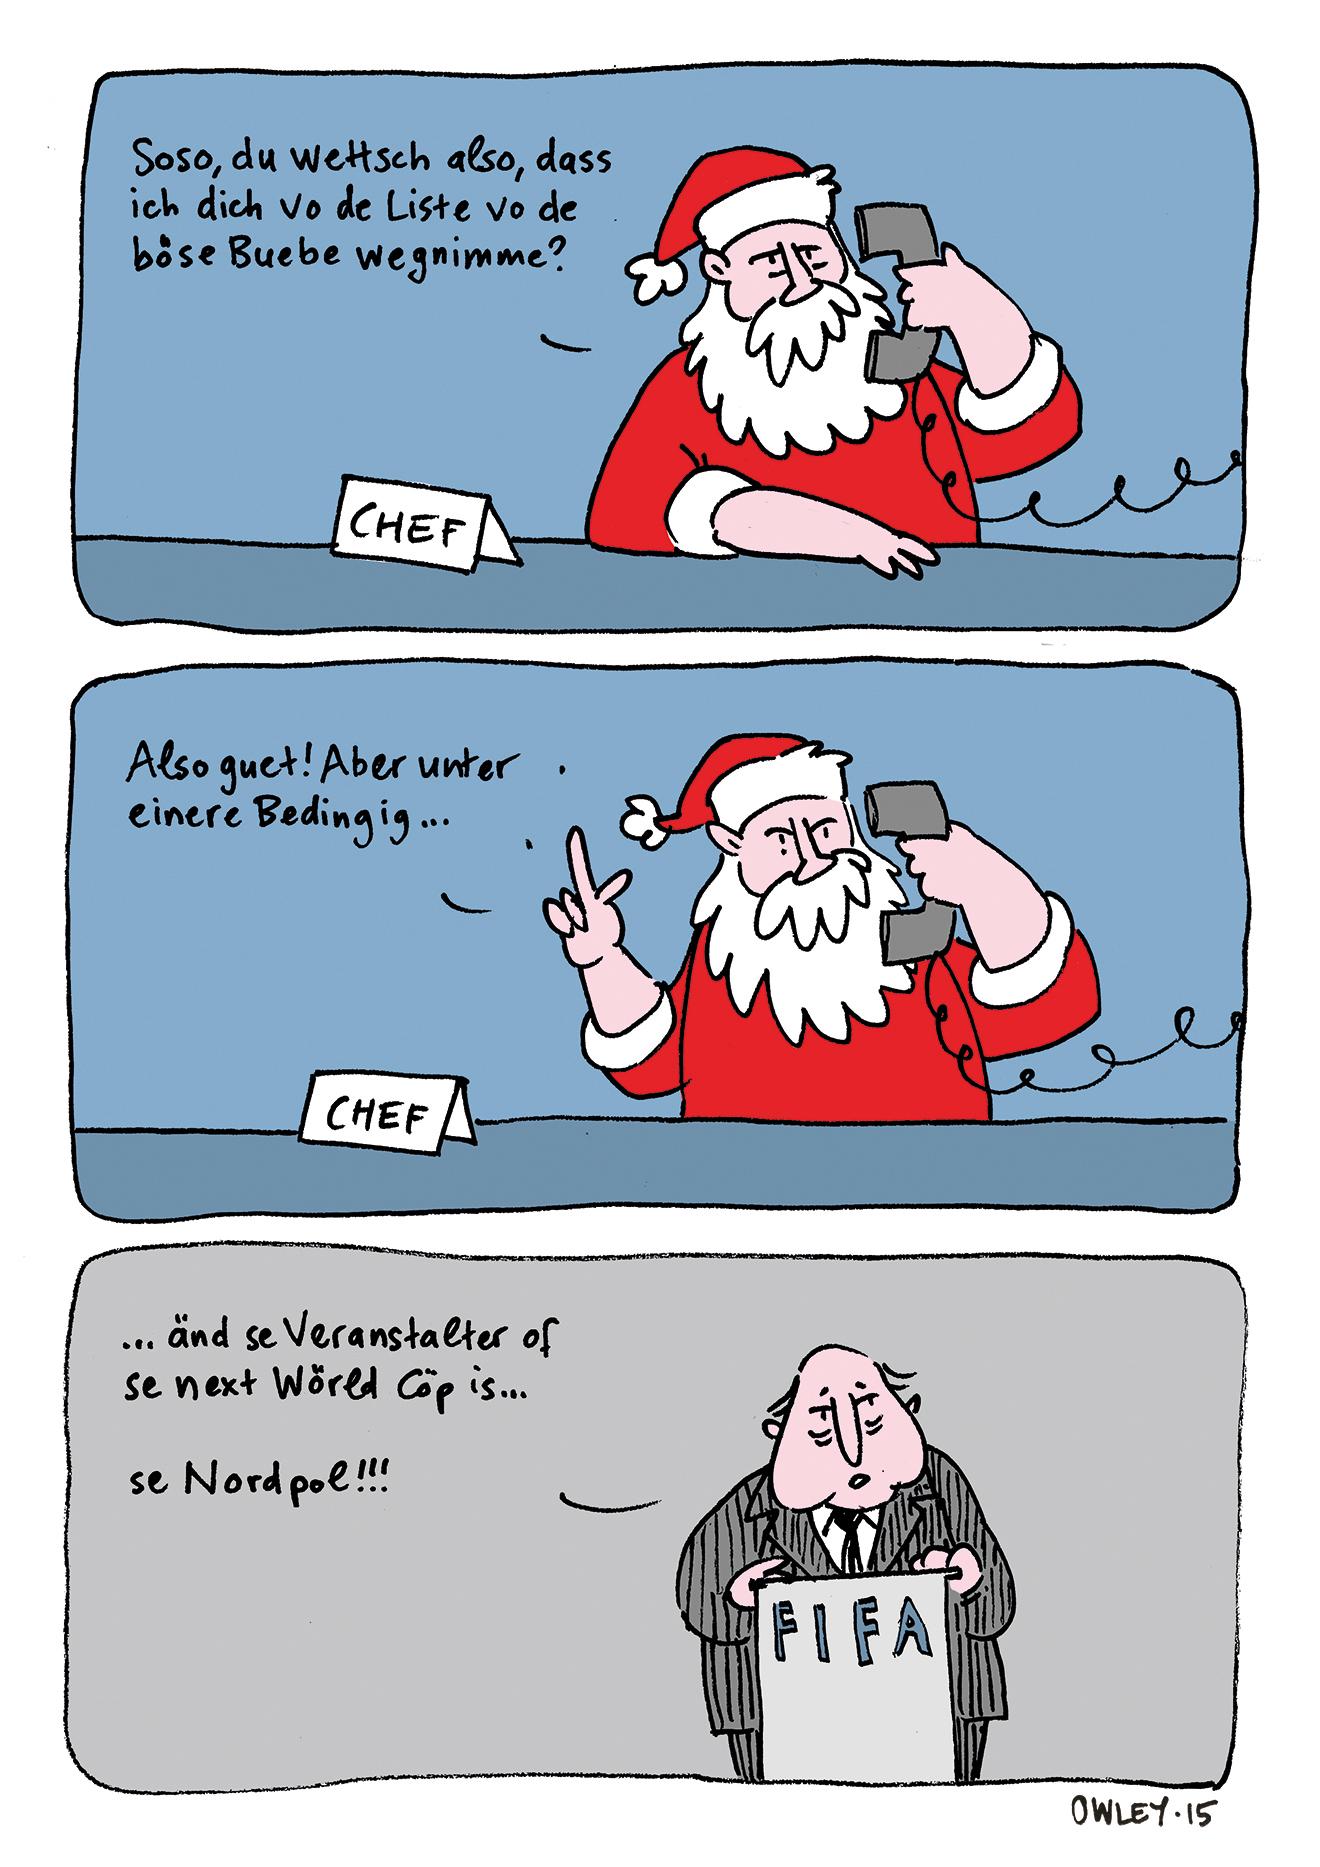 Weihnachten_2015_D_Small